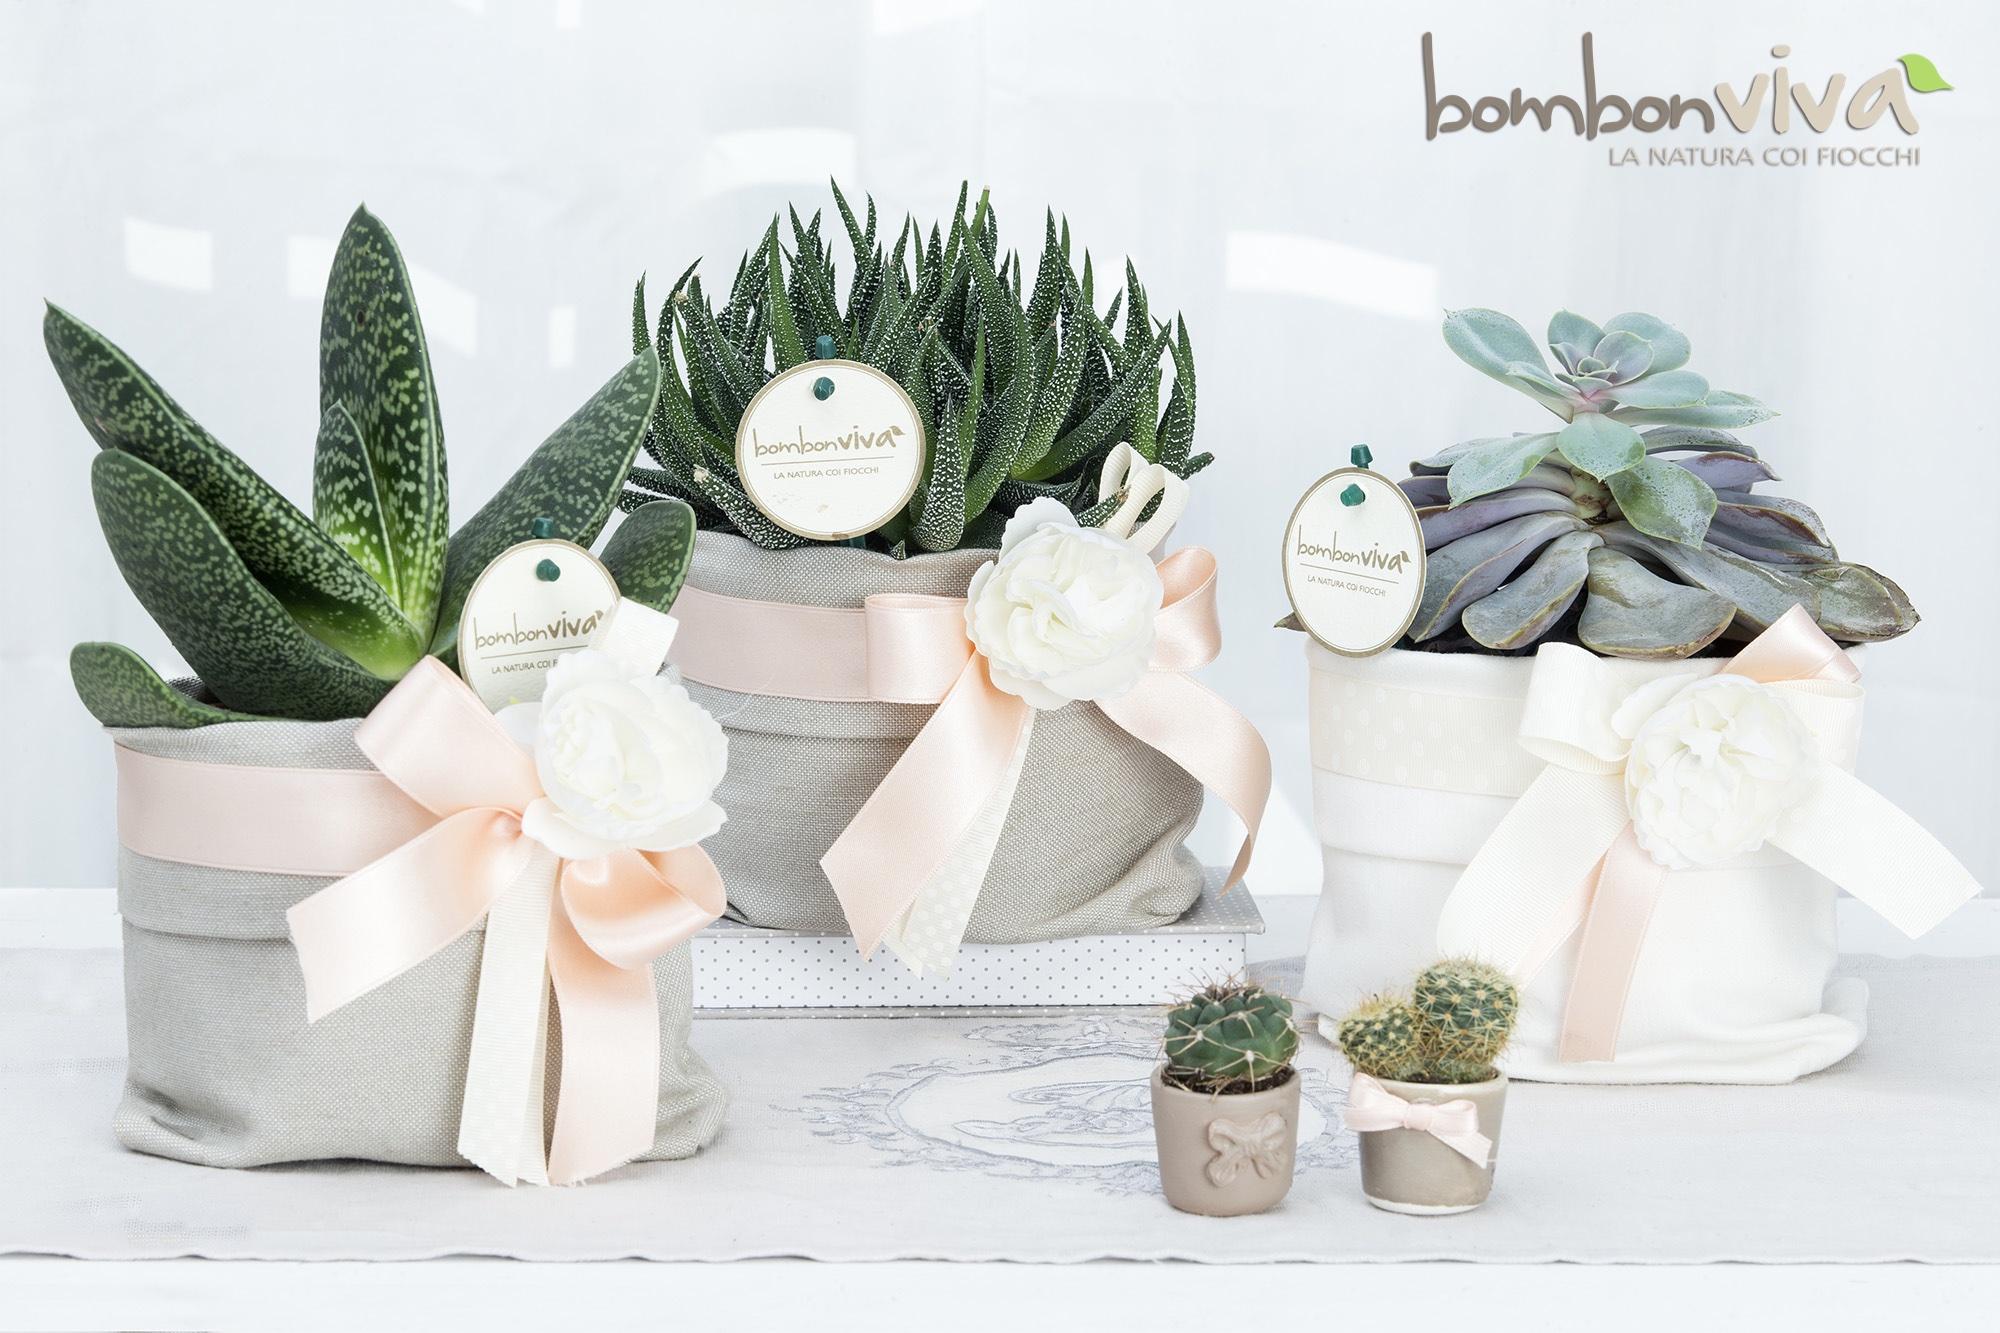 Piante Grasse Piccole Prezzi bombonvivà | bomboniere bonsai, piantine, candele